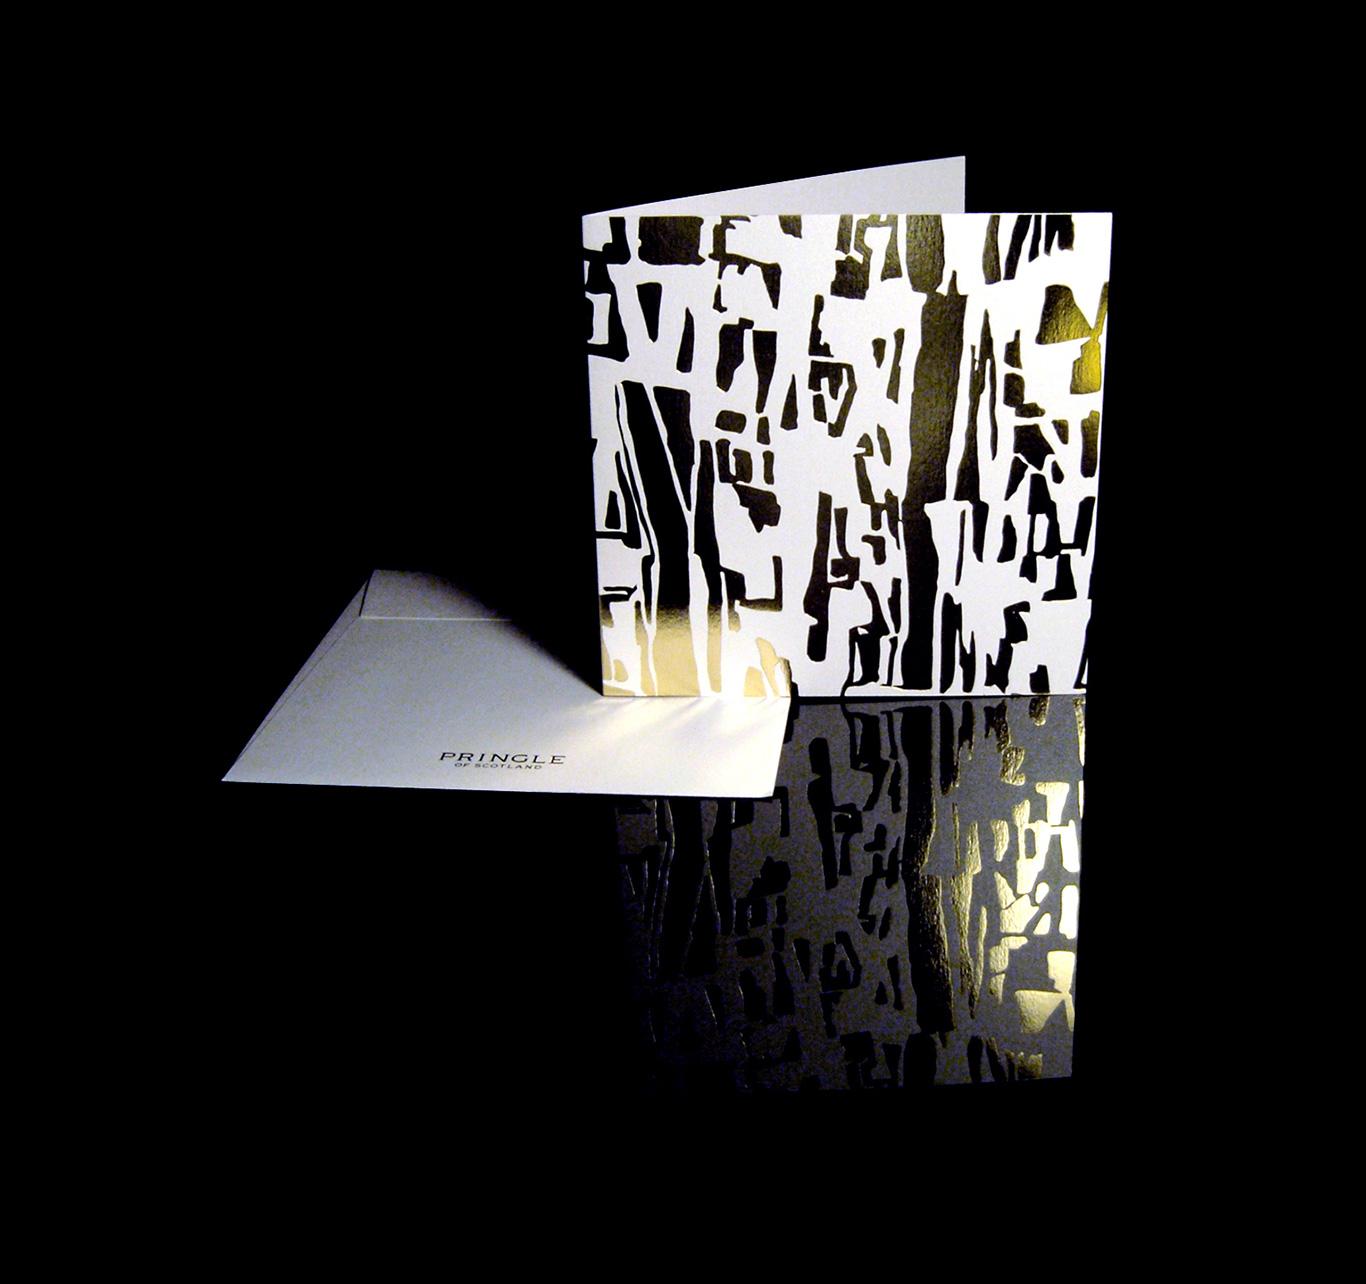 silvercard.jpg